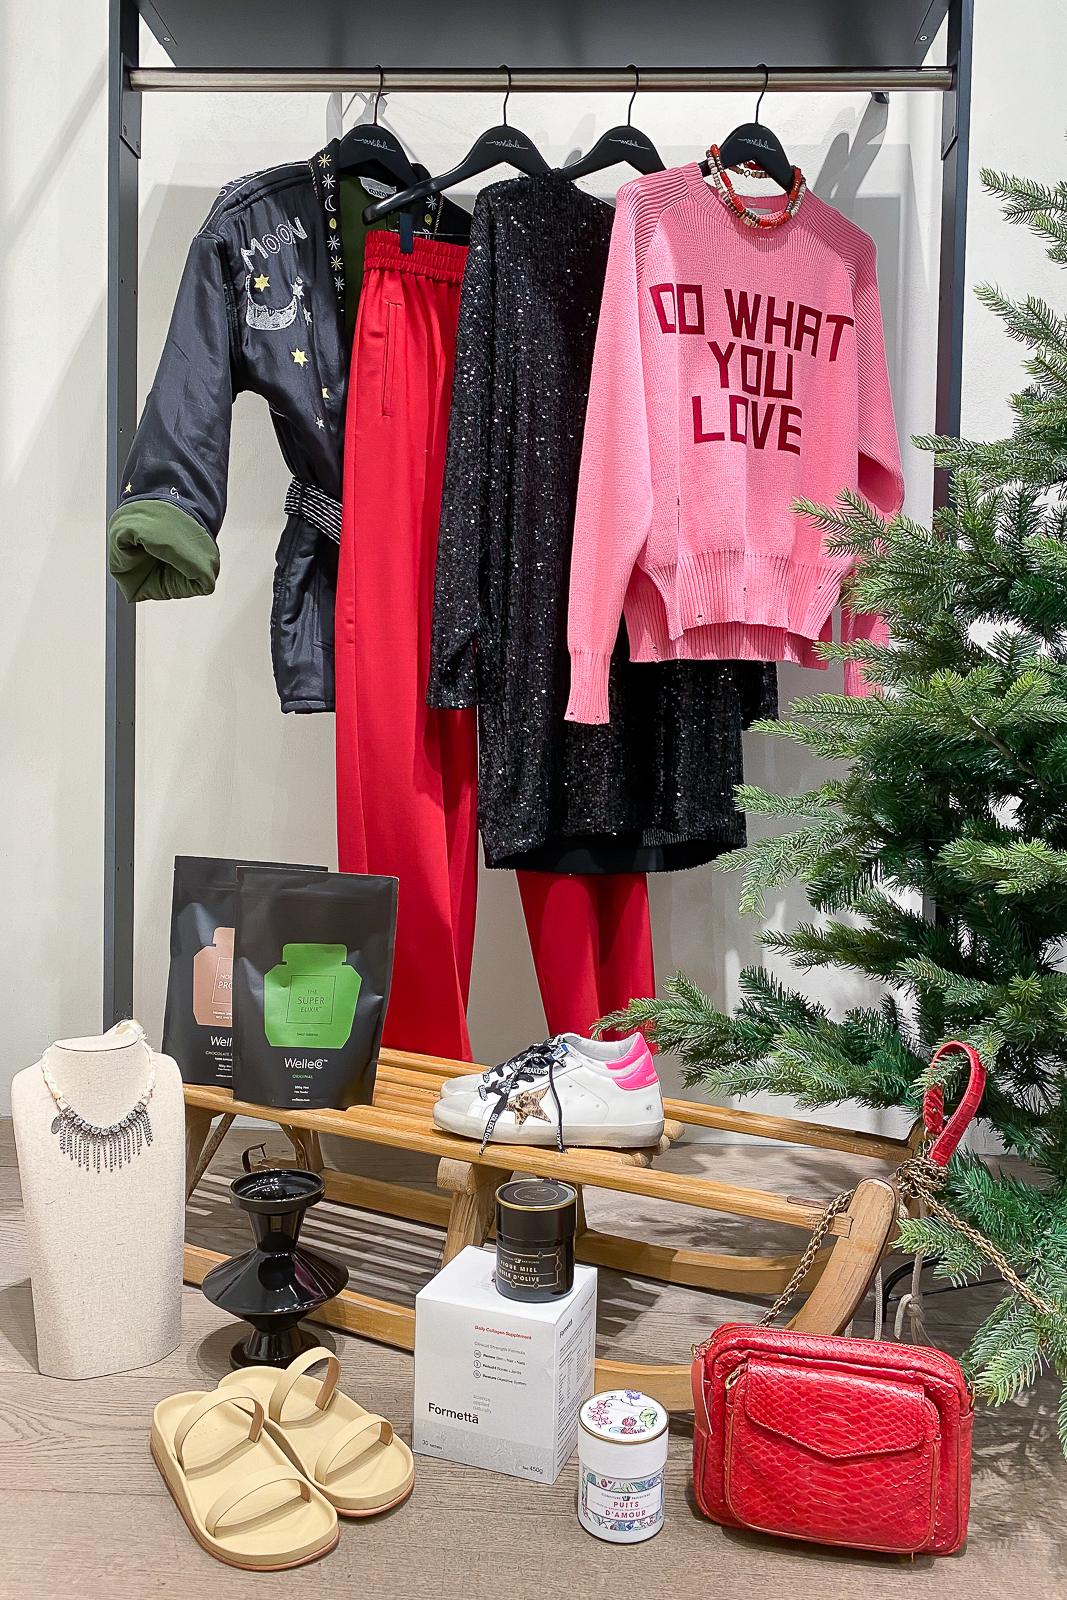 Gifts, Christmas, News, Vestibule, Zurich